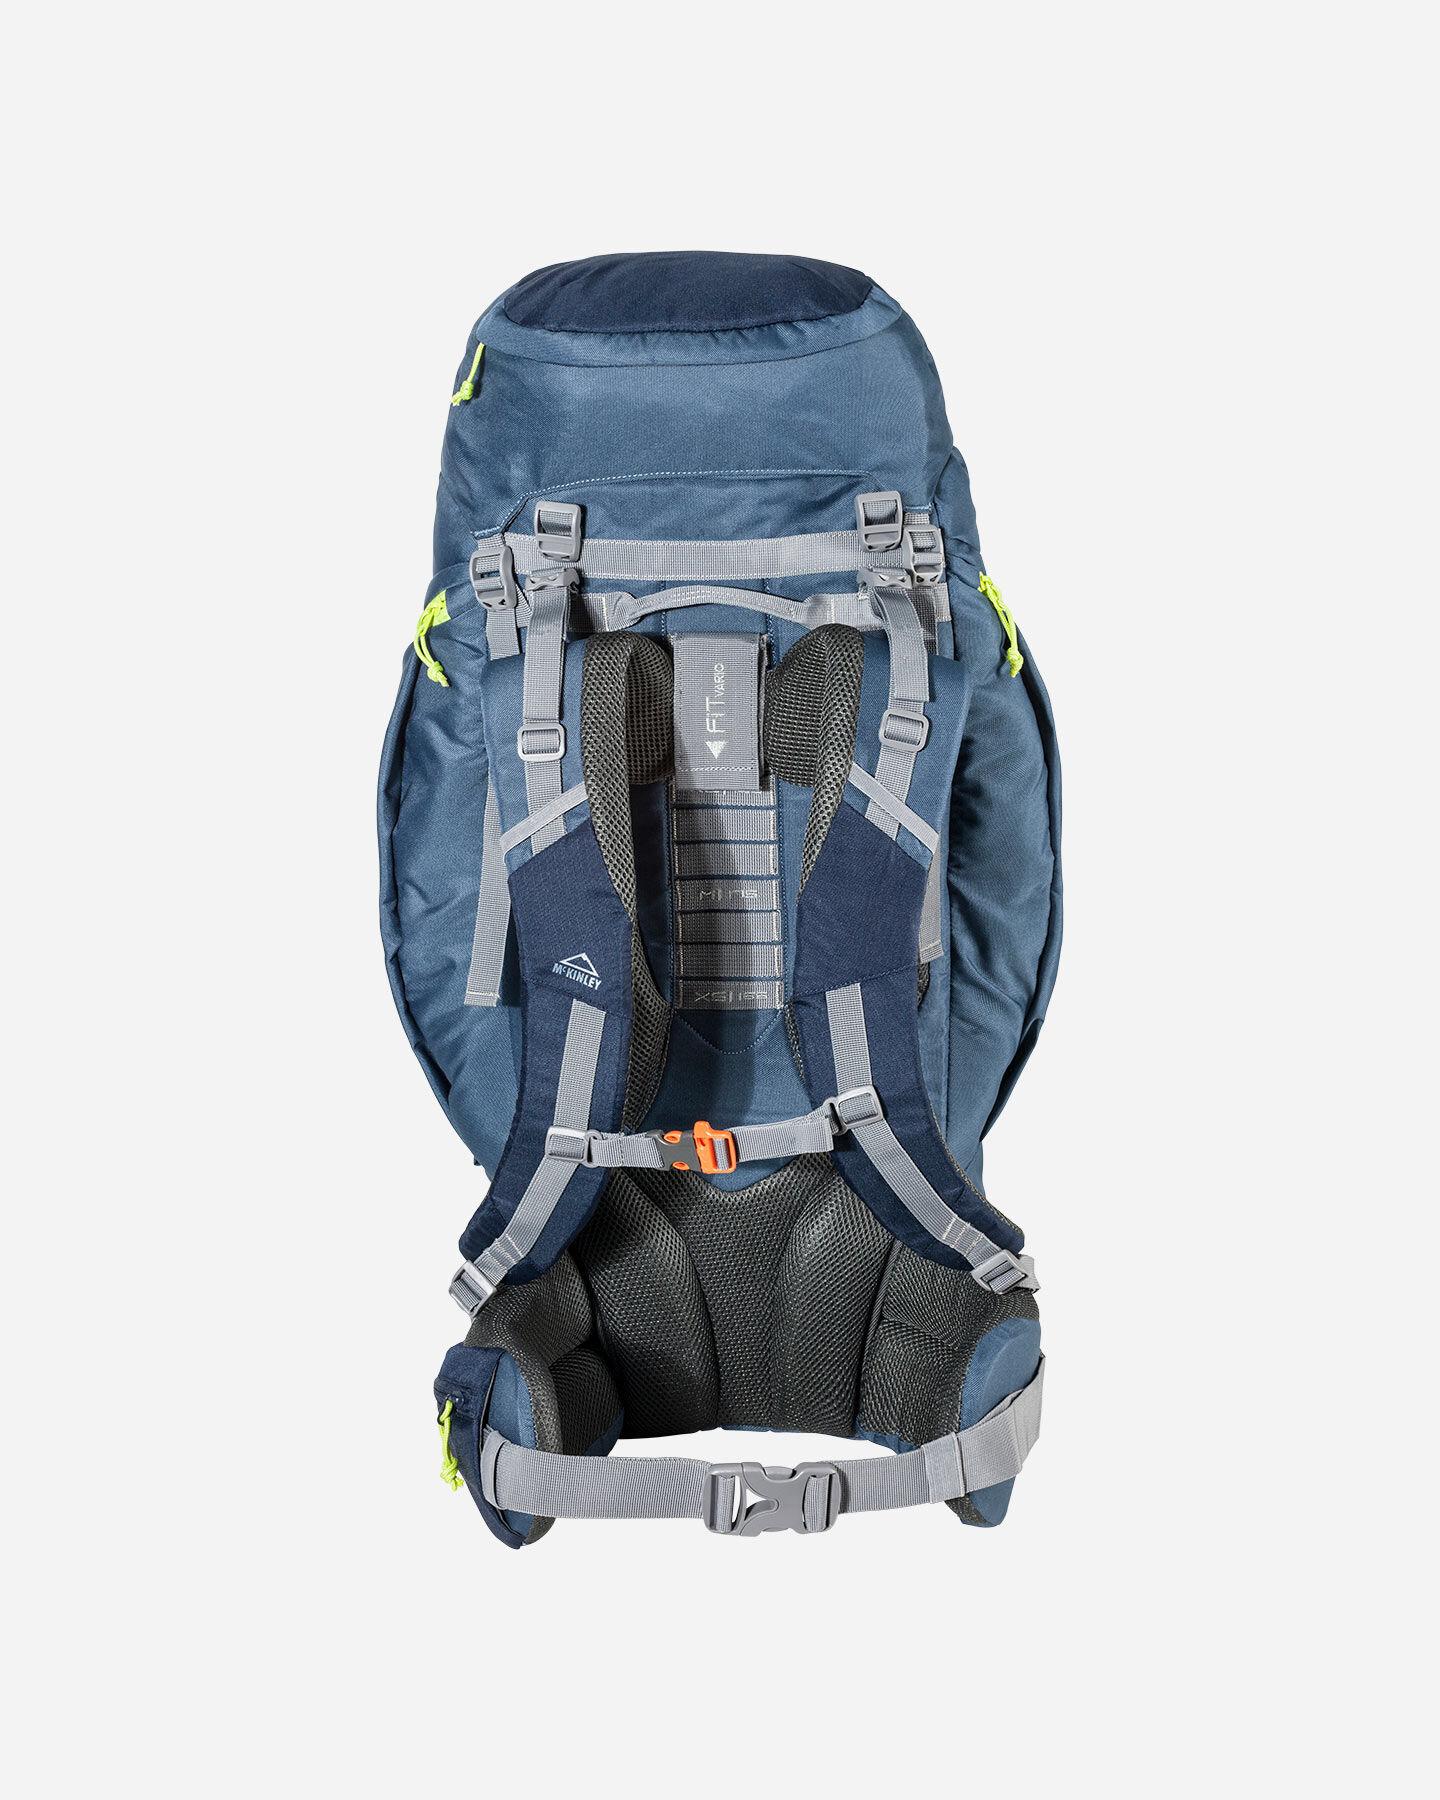 Zaino trekking MCKINLEY MAKE 65+10 RC S2001465|900|15 scatto 1